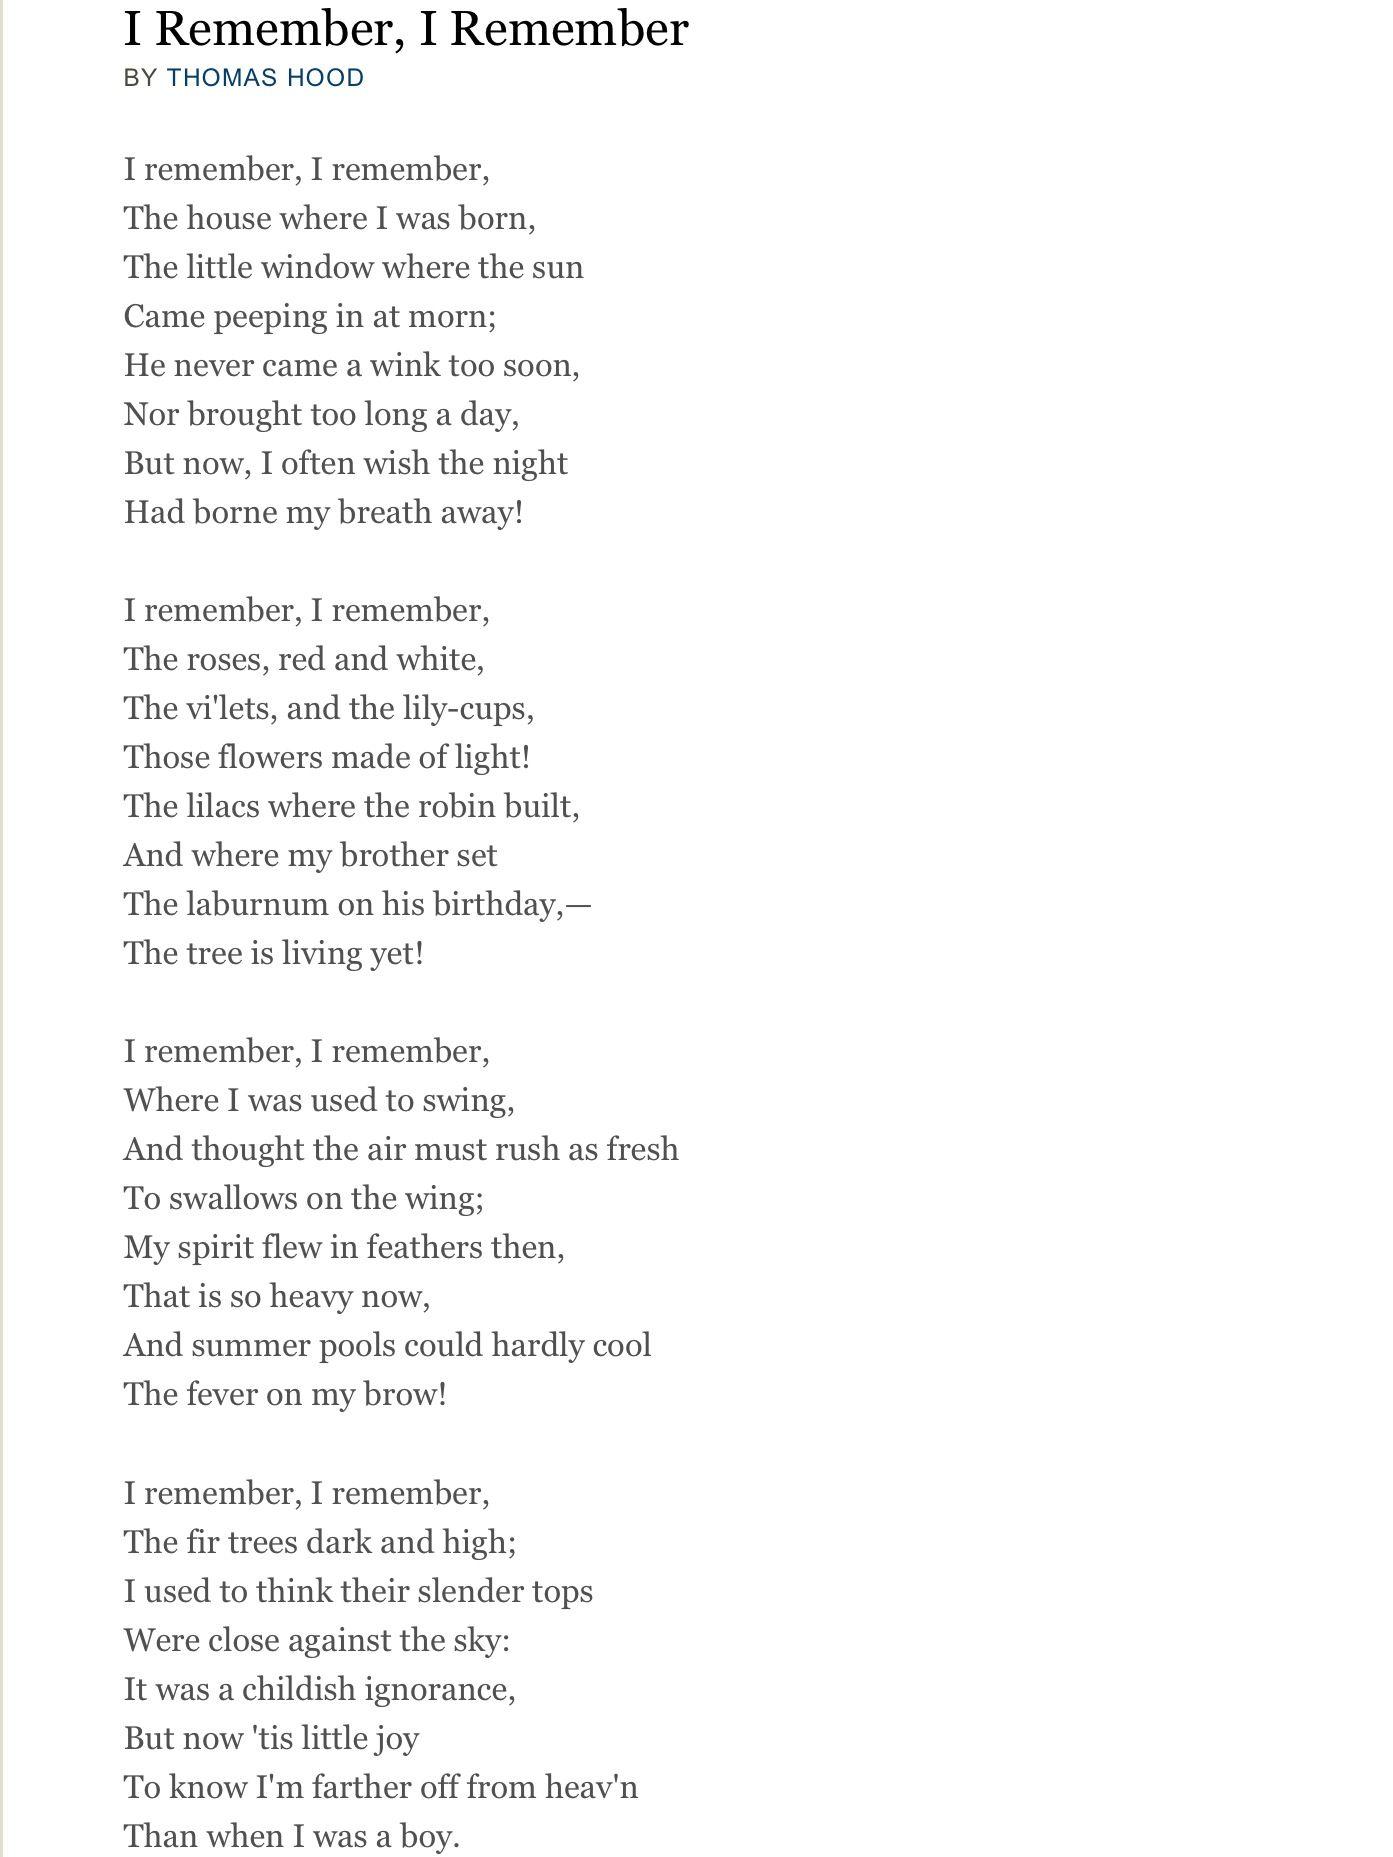 summary of the poem no by thomas hood